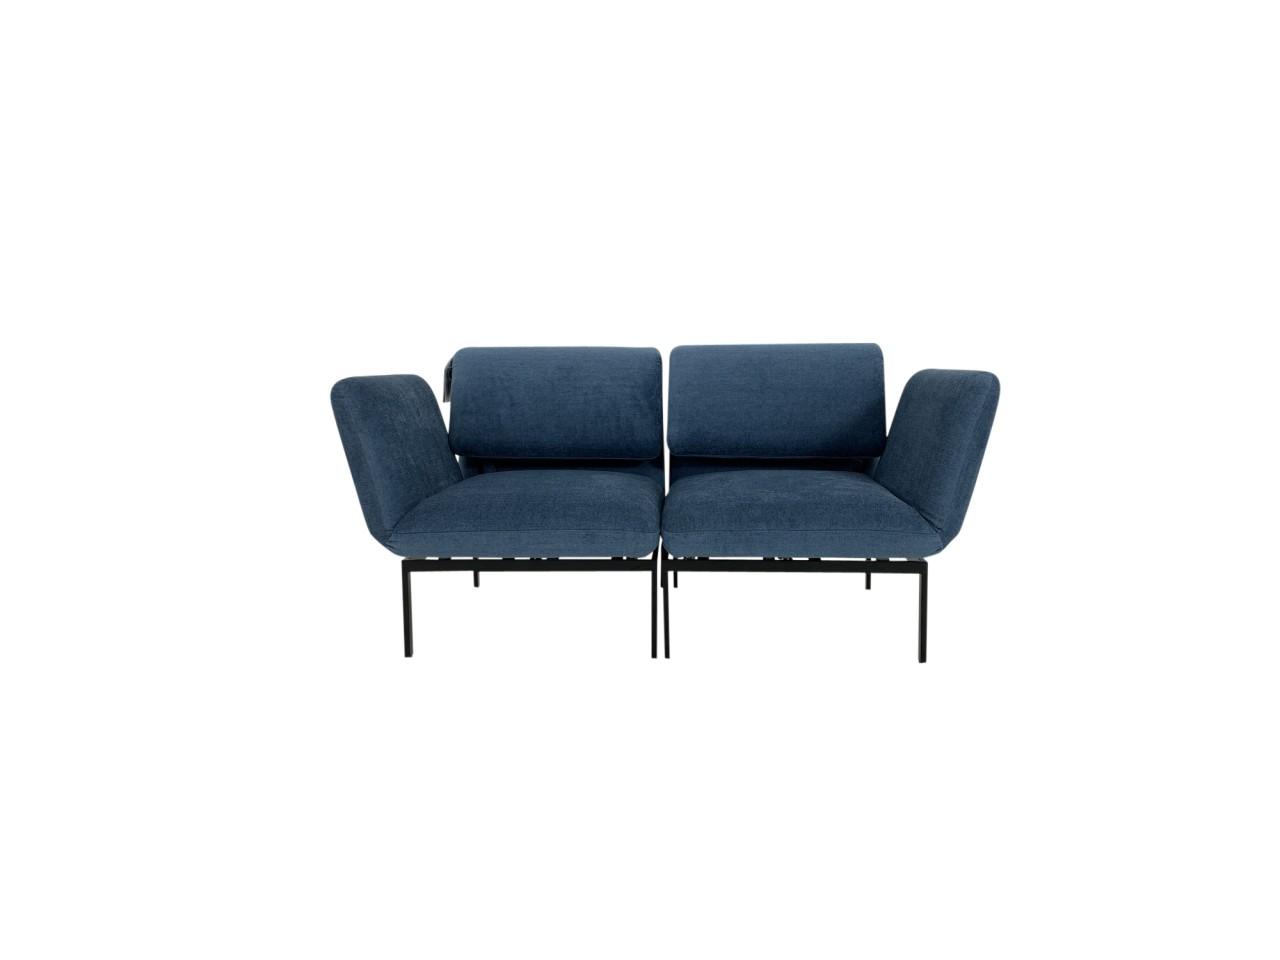 Brühl RORO small Liege Sessel Set im edlen Stoff petrolblau mit Gestell schwarz